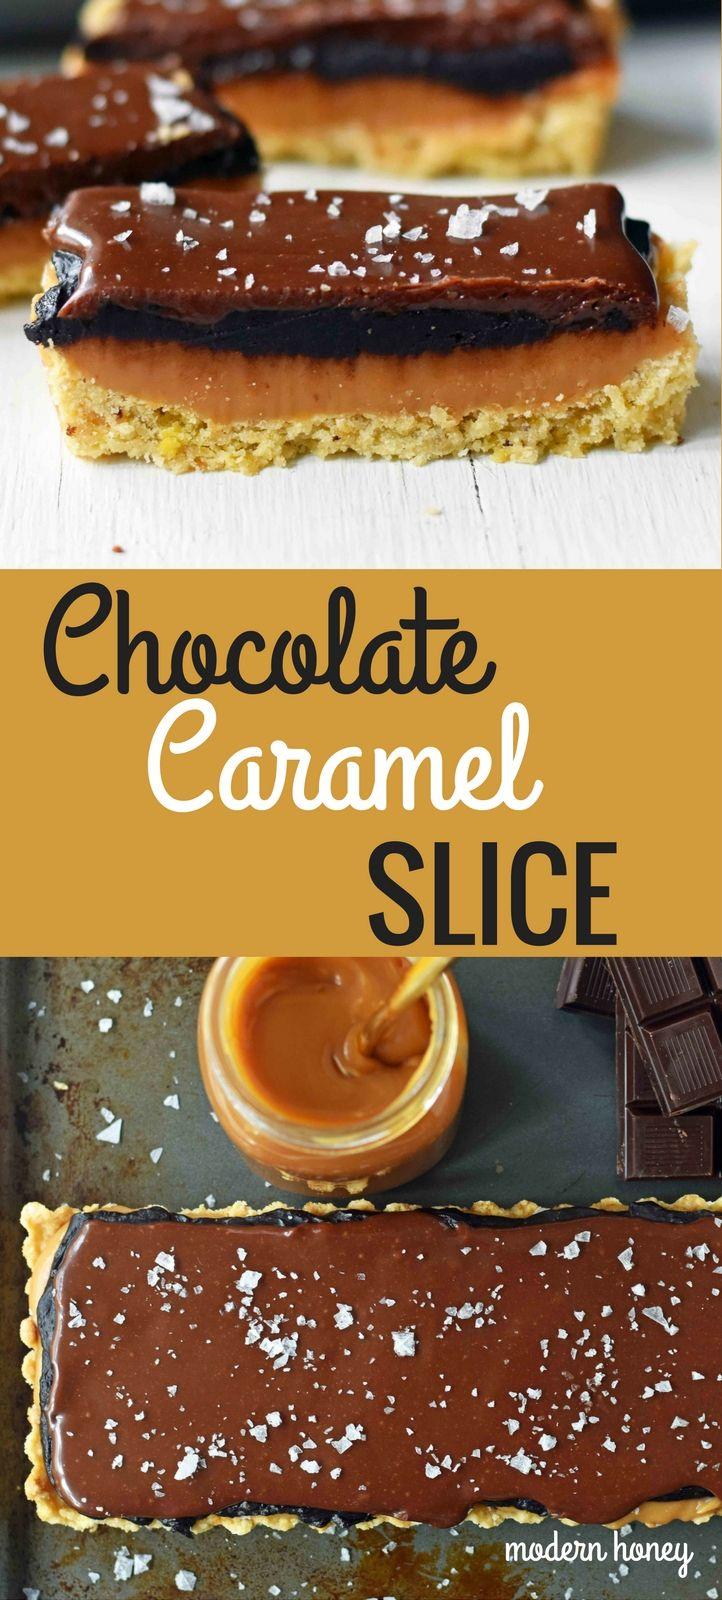 Chocolate Caramel Slice is a dessert with a buttery shortbread crust, creamy handcrafted caramel, and a silky smooth chocolate glaze. A gourmet Twix candy bar! www.modernhoney.com